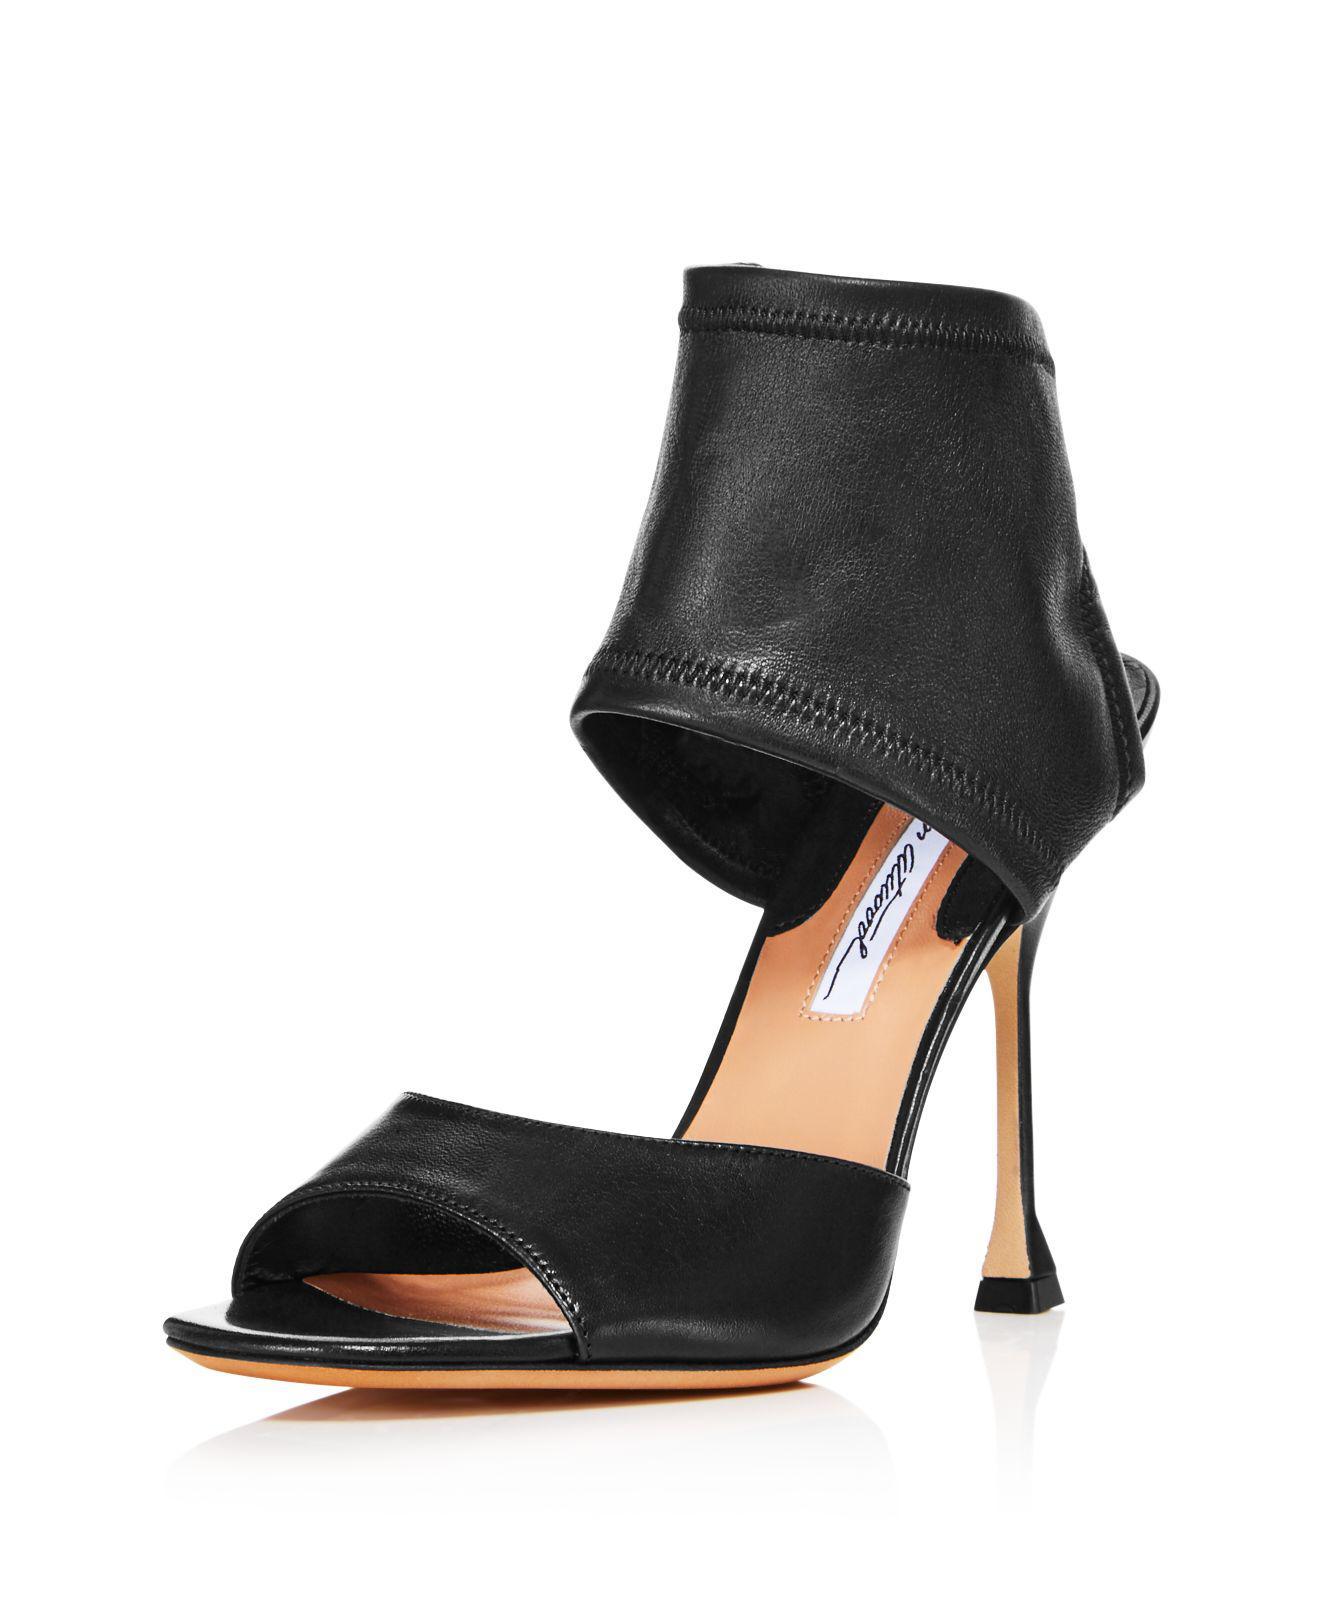 BRIAN ATWOOD Women's Stella Stretch Leather High-Heel Sandals A3zLvoj